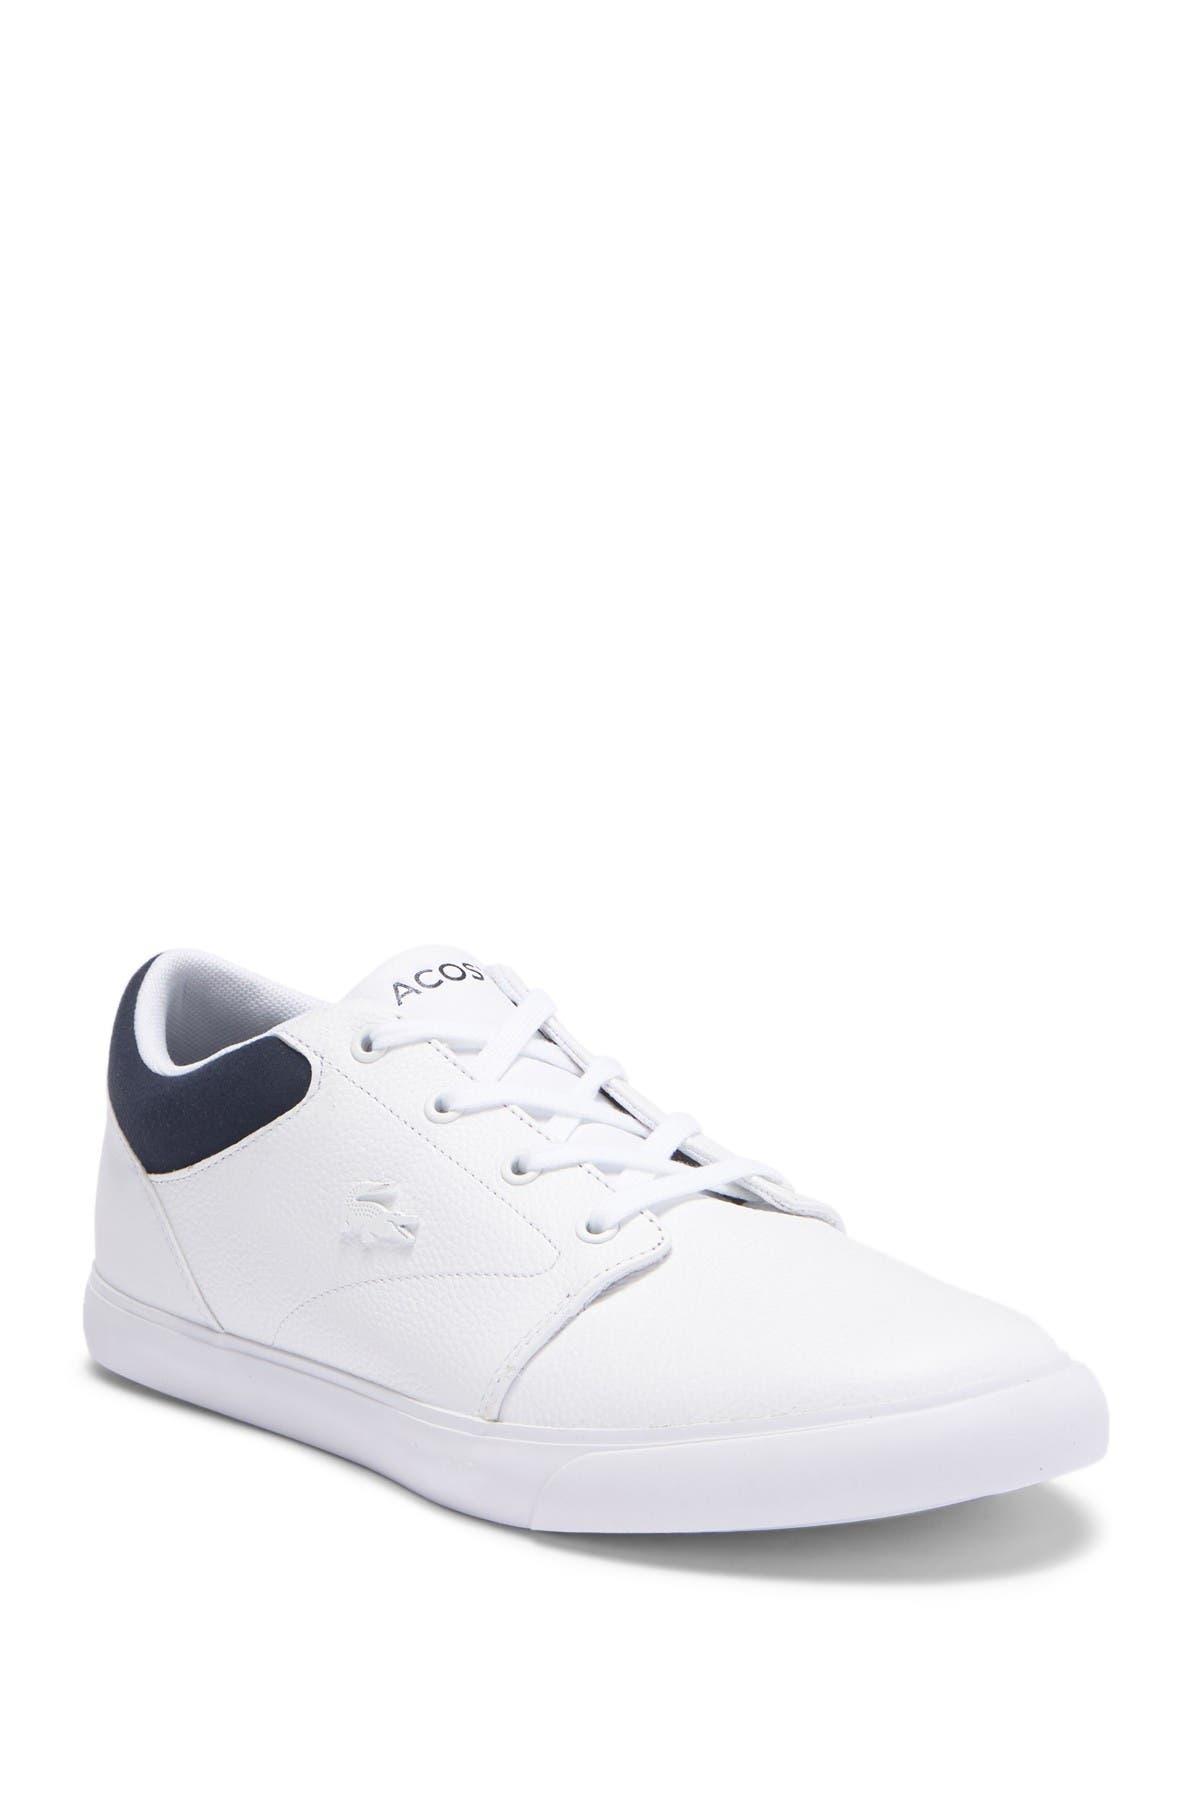 Minzah 318 1 P Leather Sneaker